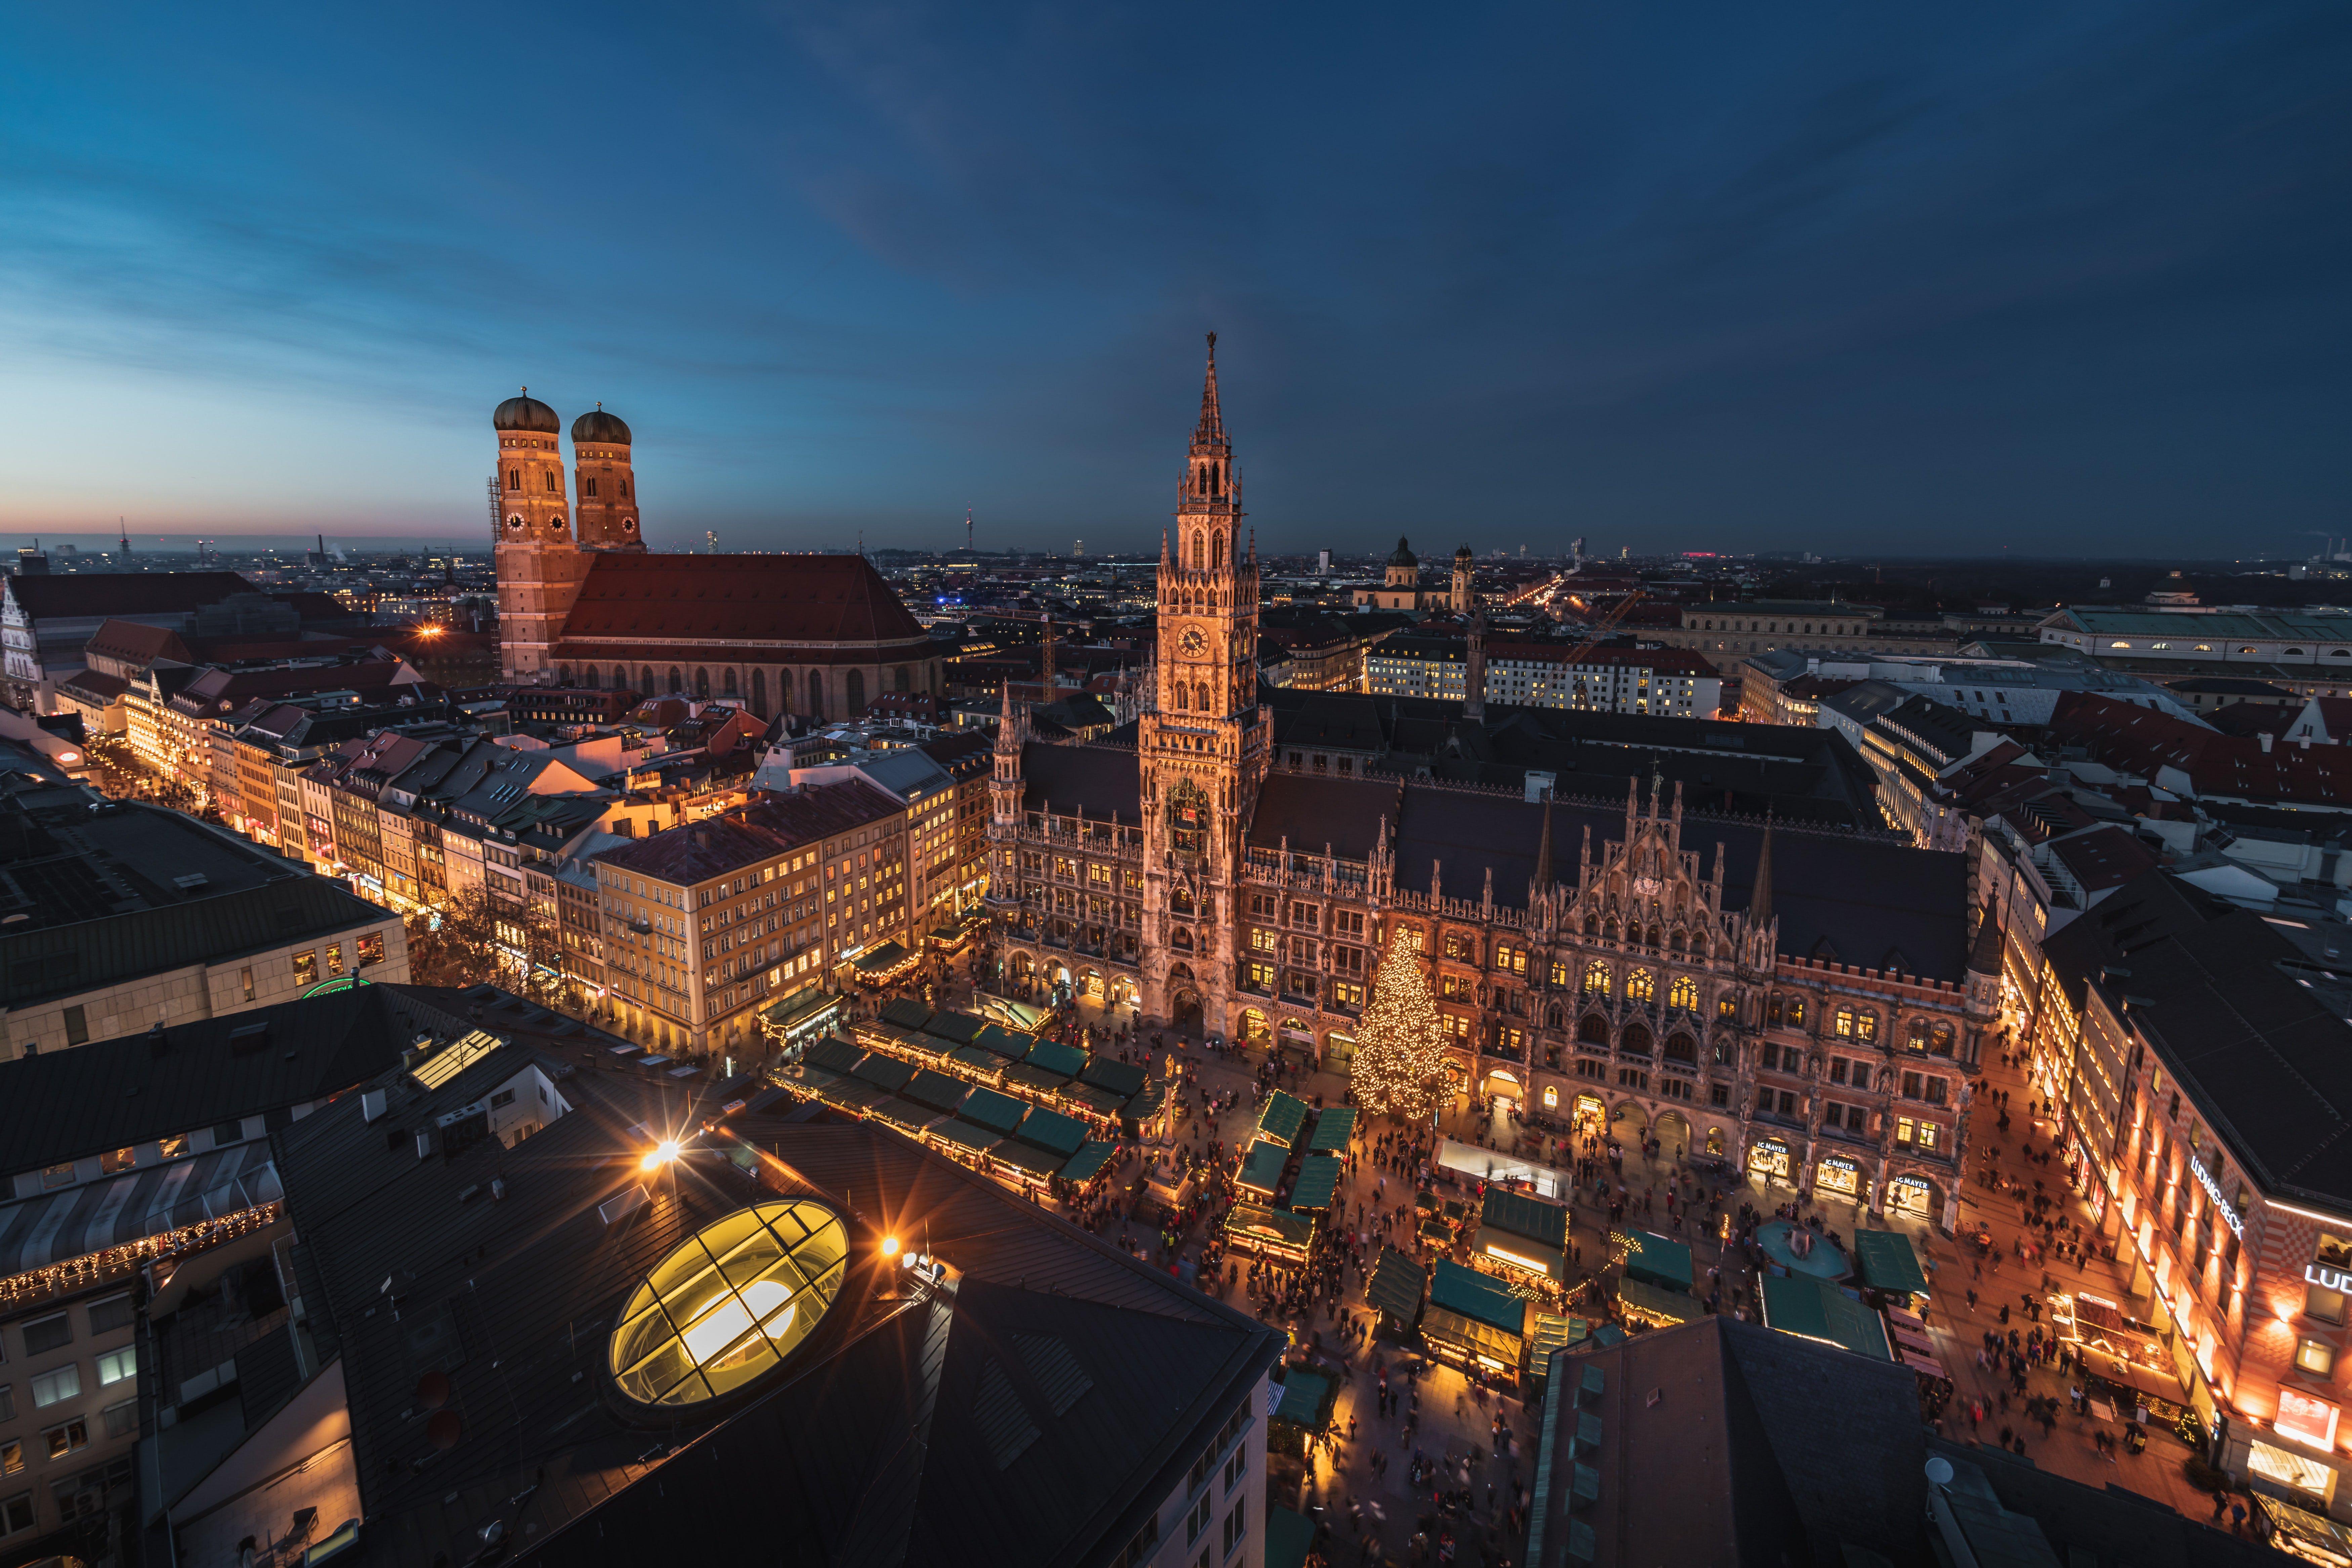 Munich_daniel-sessler-C6l894Q7wpI-unsplash.jpg